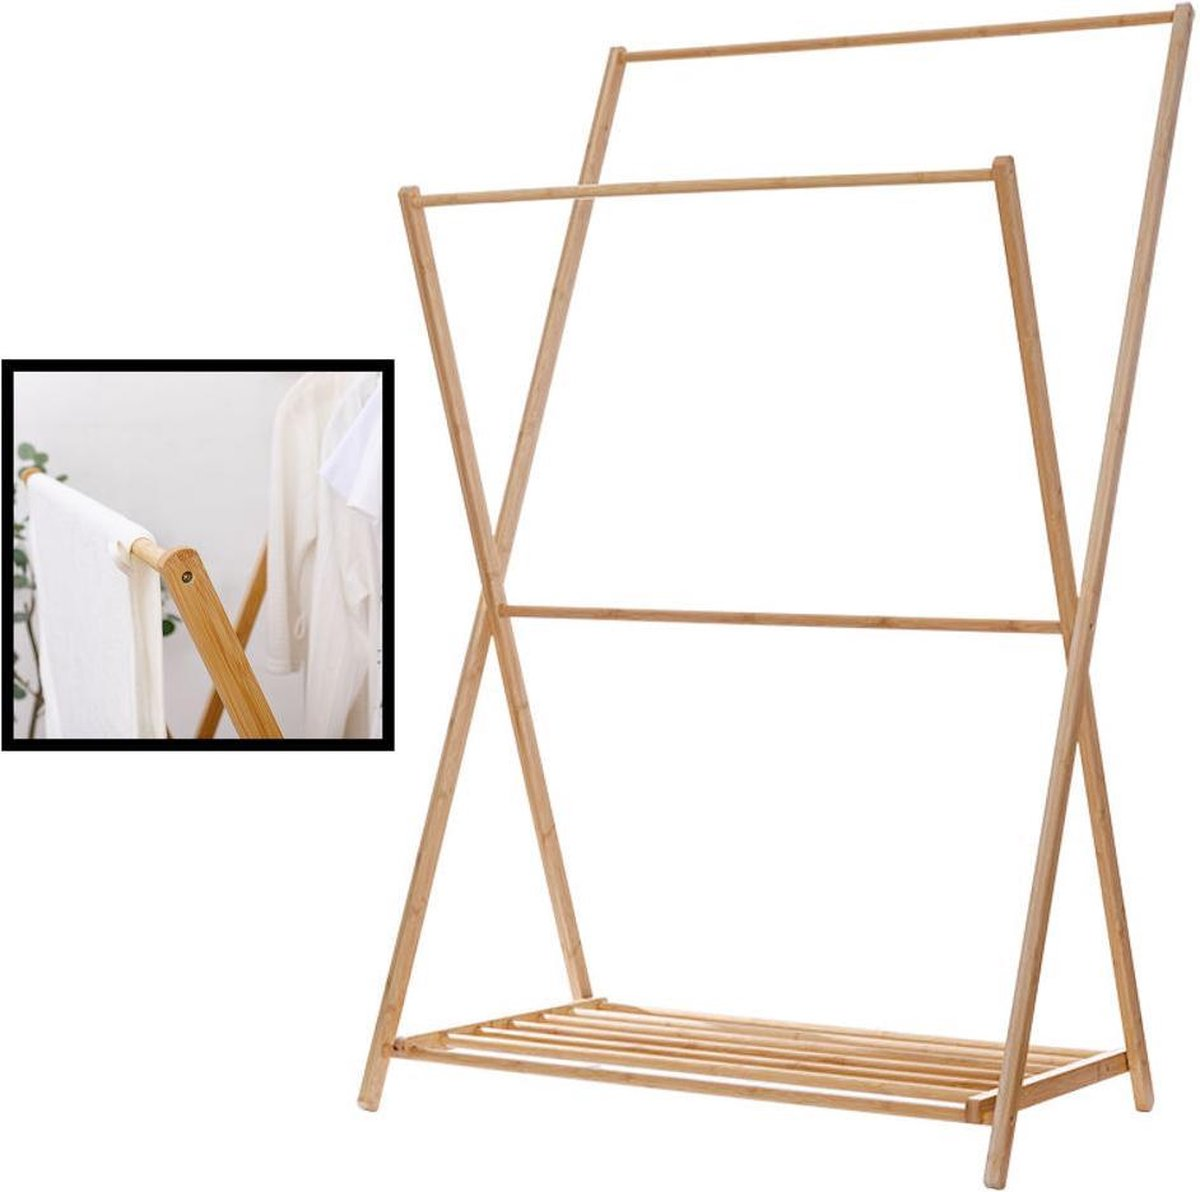 Decopatent® Staand Kledingrek met 1 Legplank en 2 Hangstangen - Kledingstandaard - Garderobe slaapkamer - Bamboe hout - 90x55x150